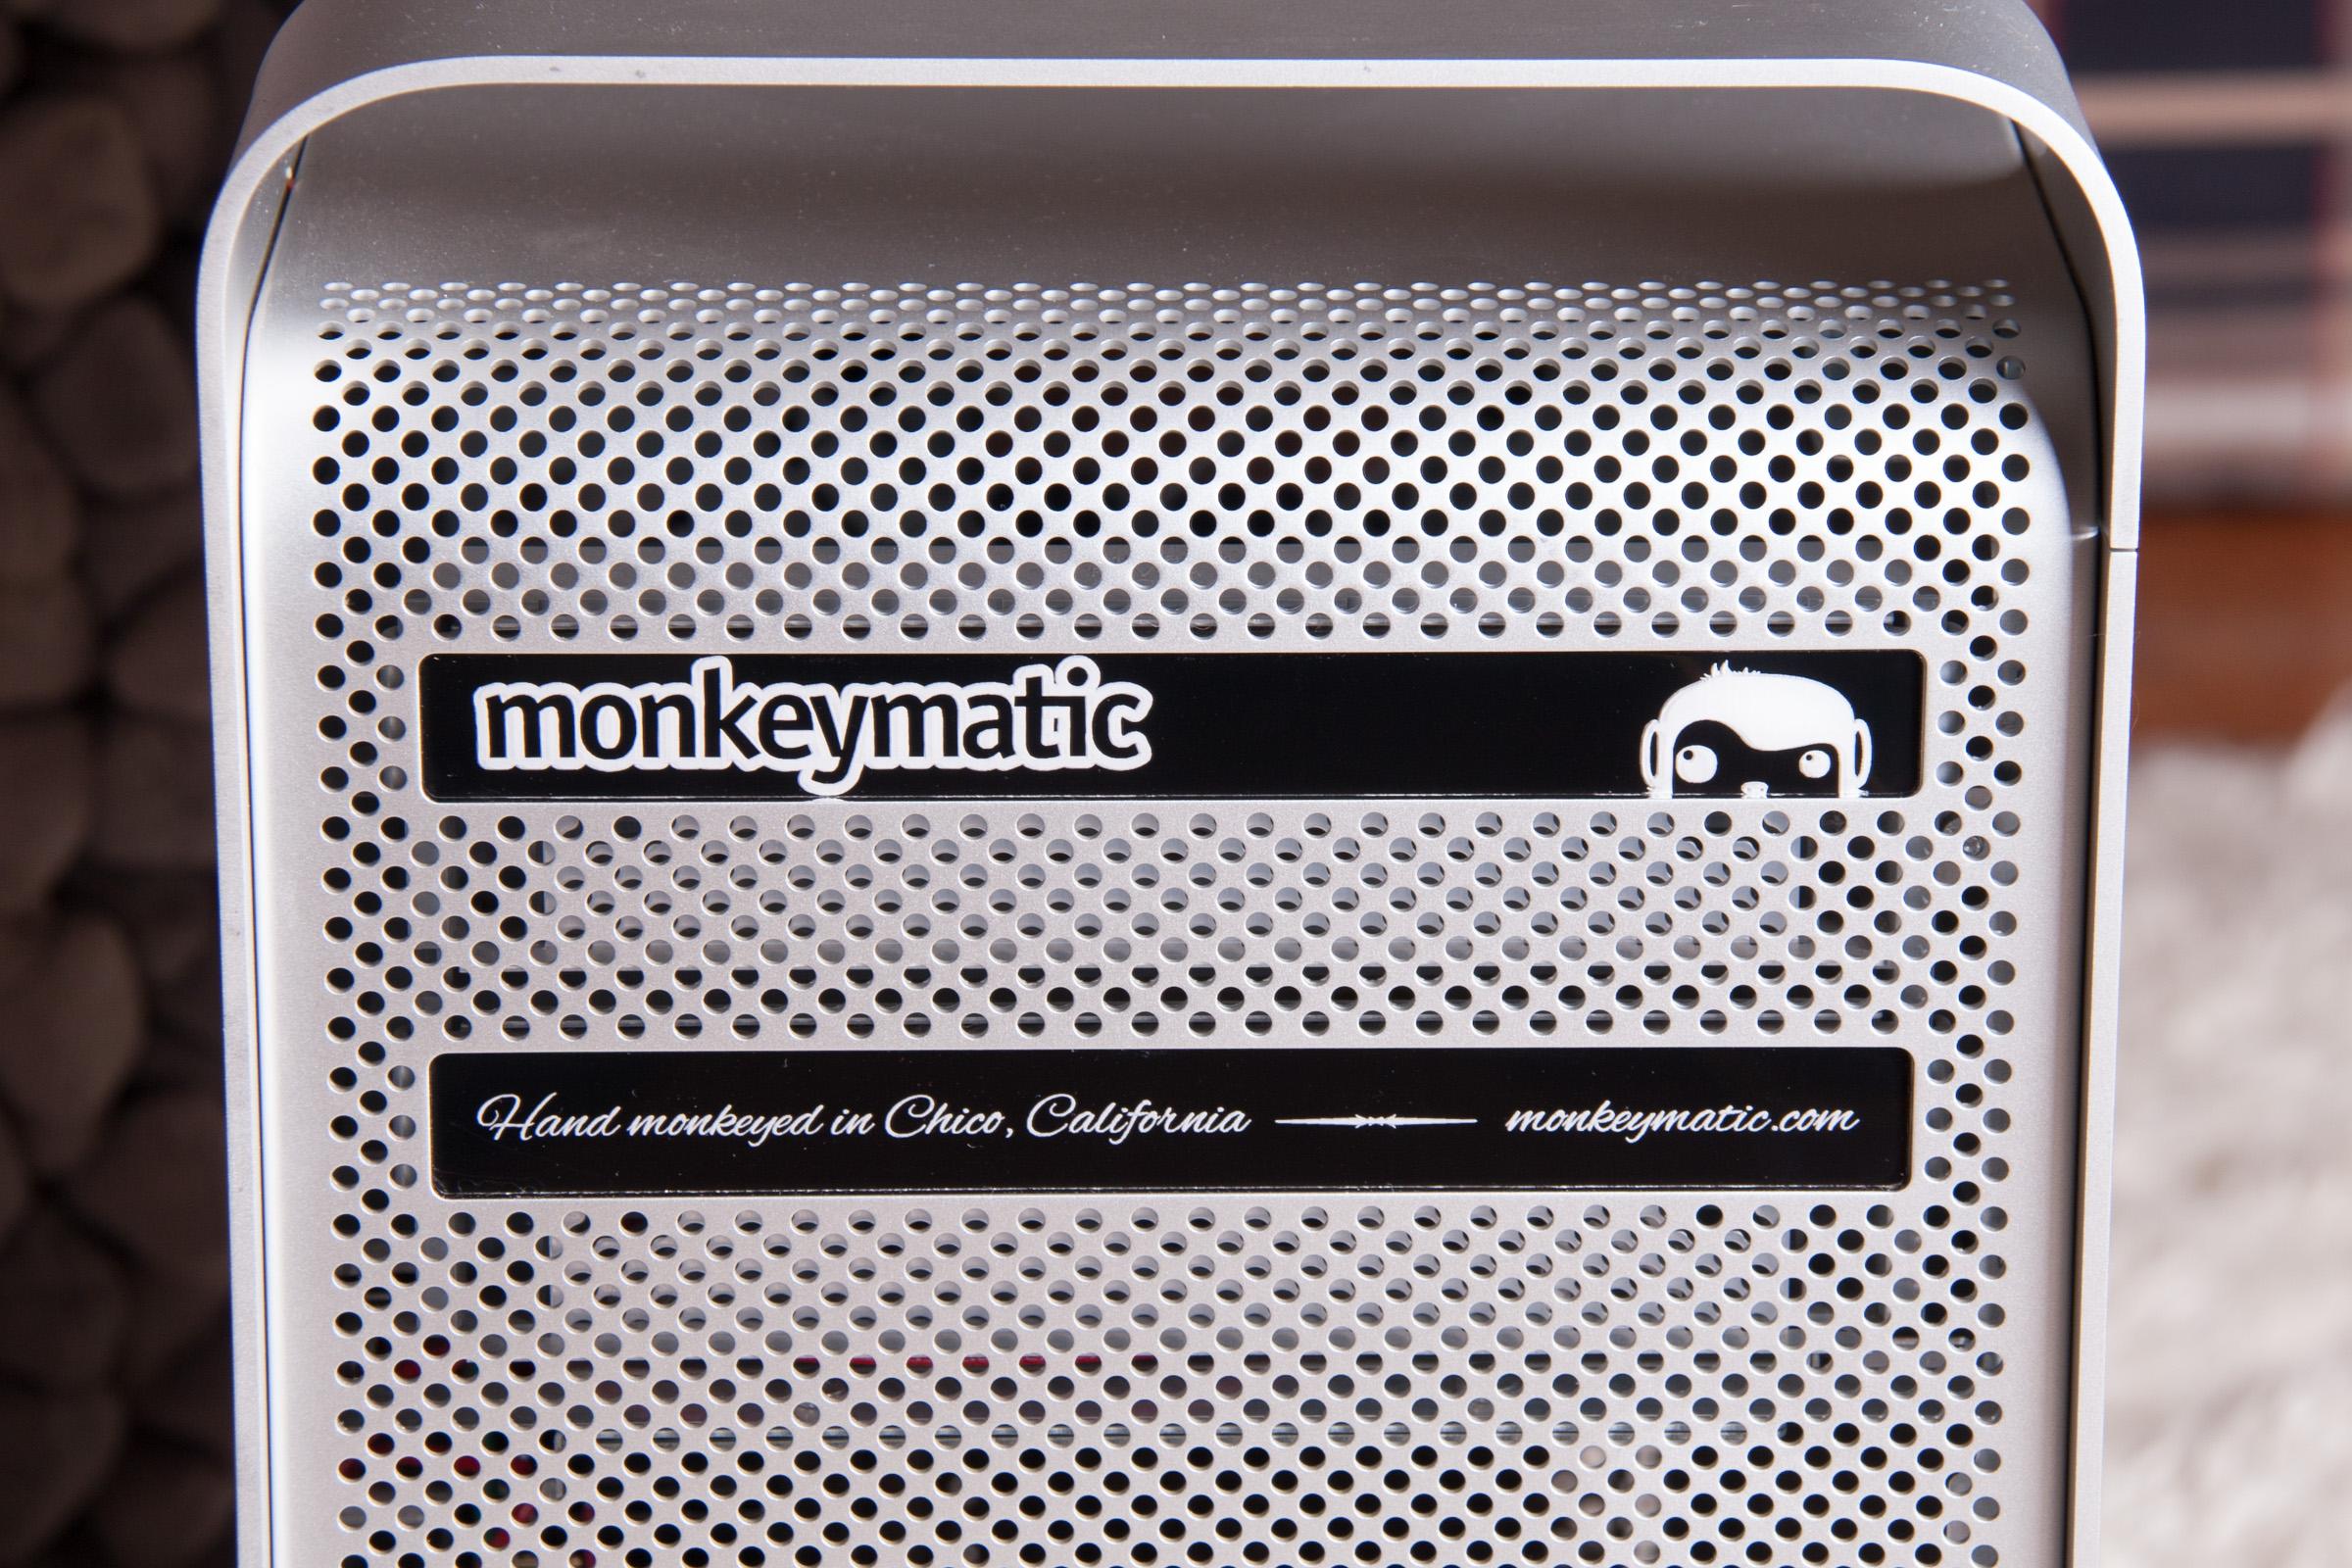 monkeymatic_macpro-3.jpg